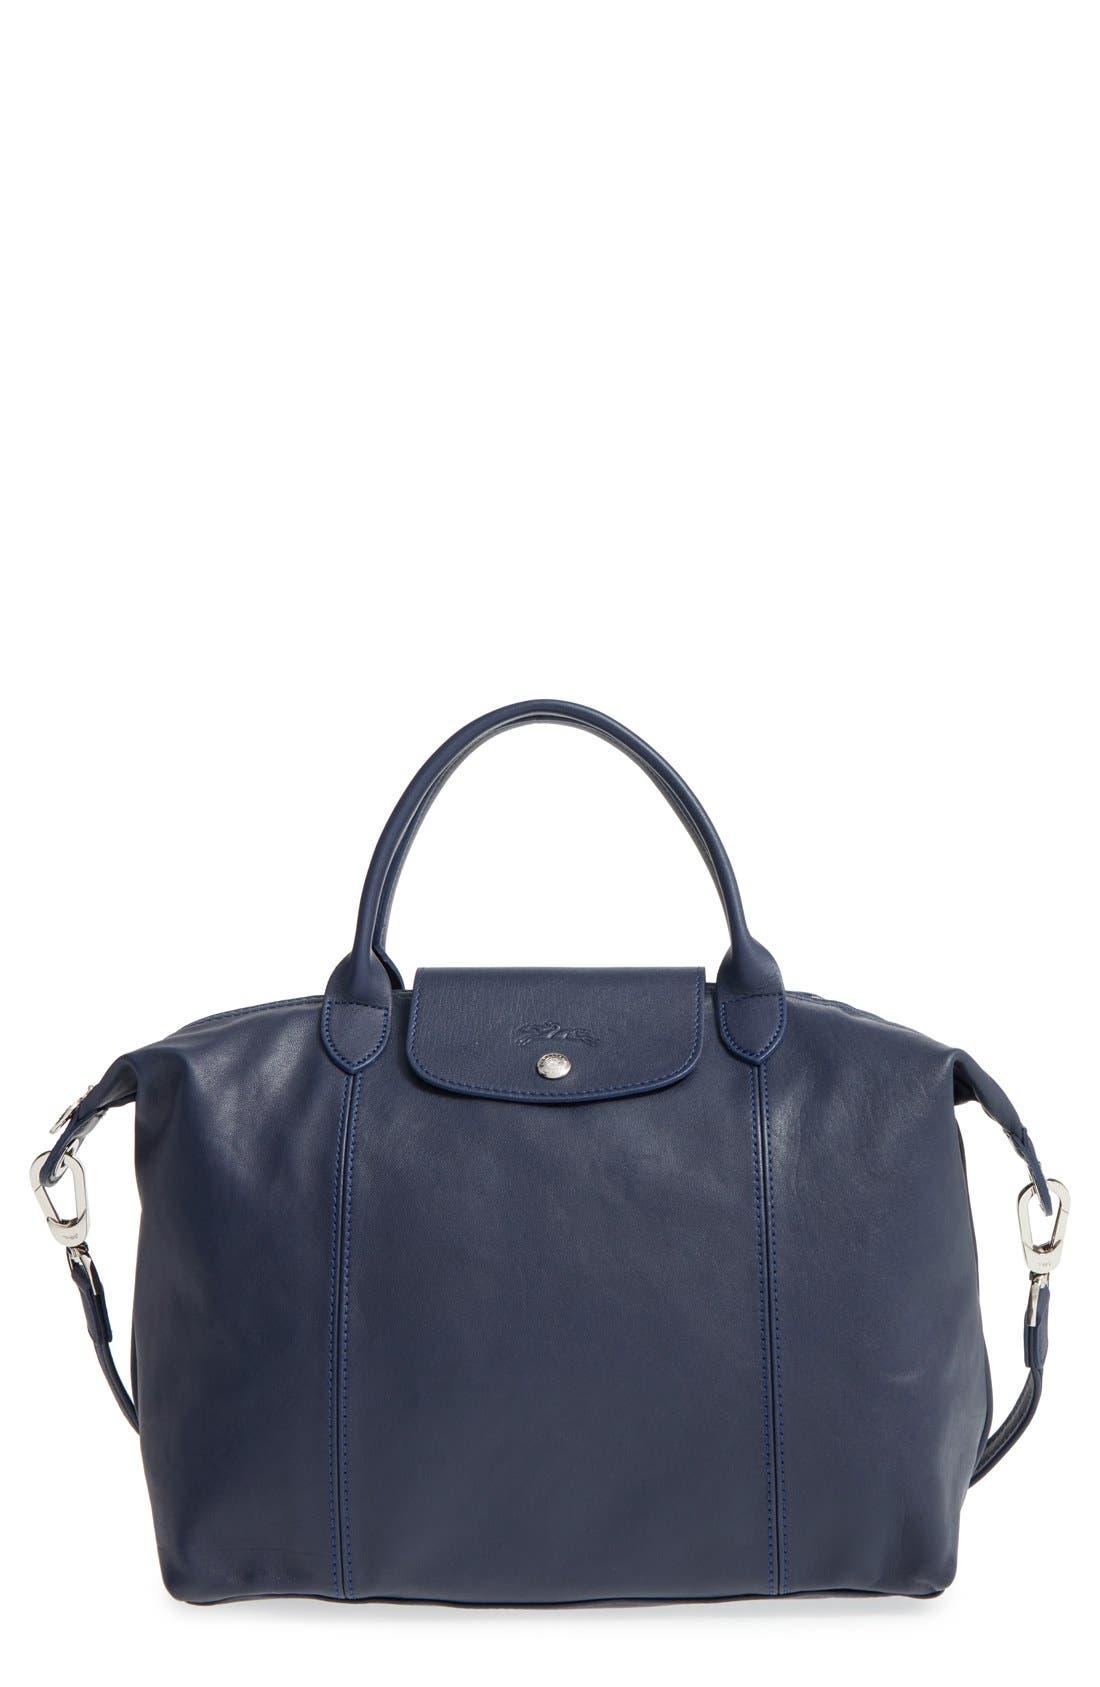 Alternate Image 1 Selected - Longchamp 'Le Pliage Cuir' Leather Handbag